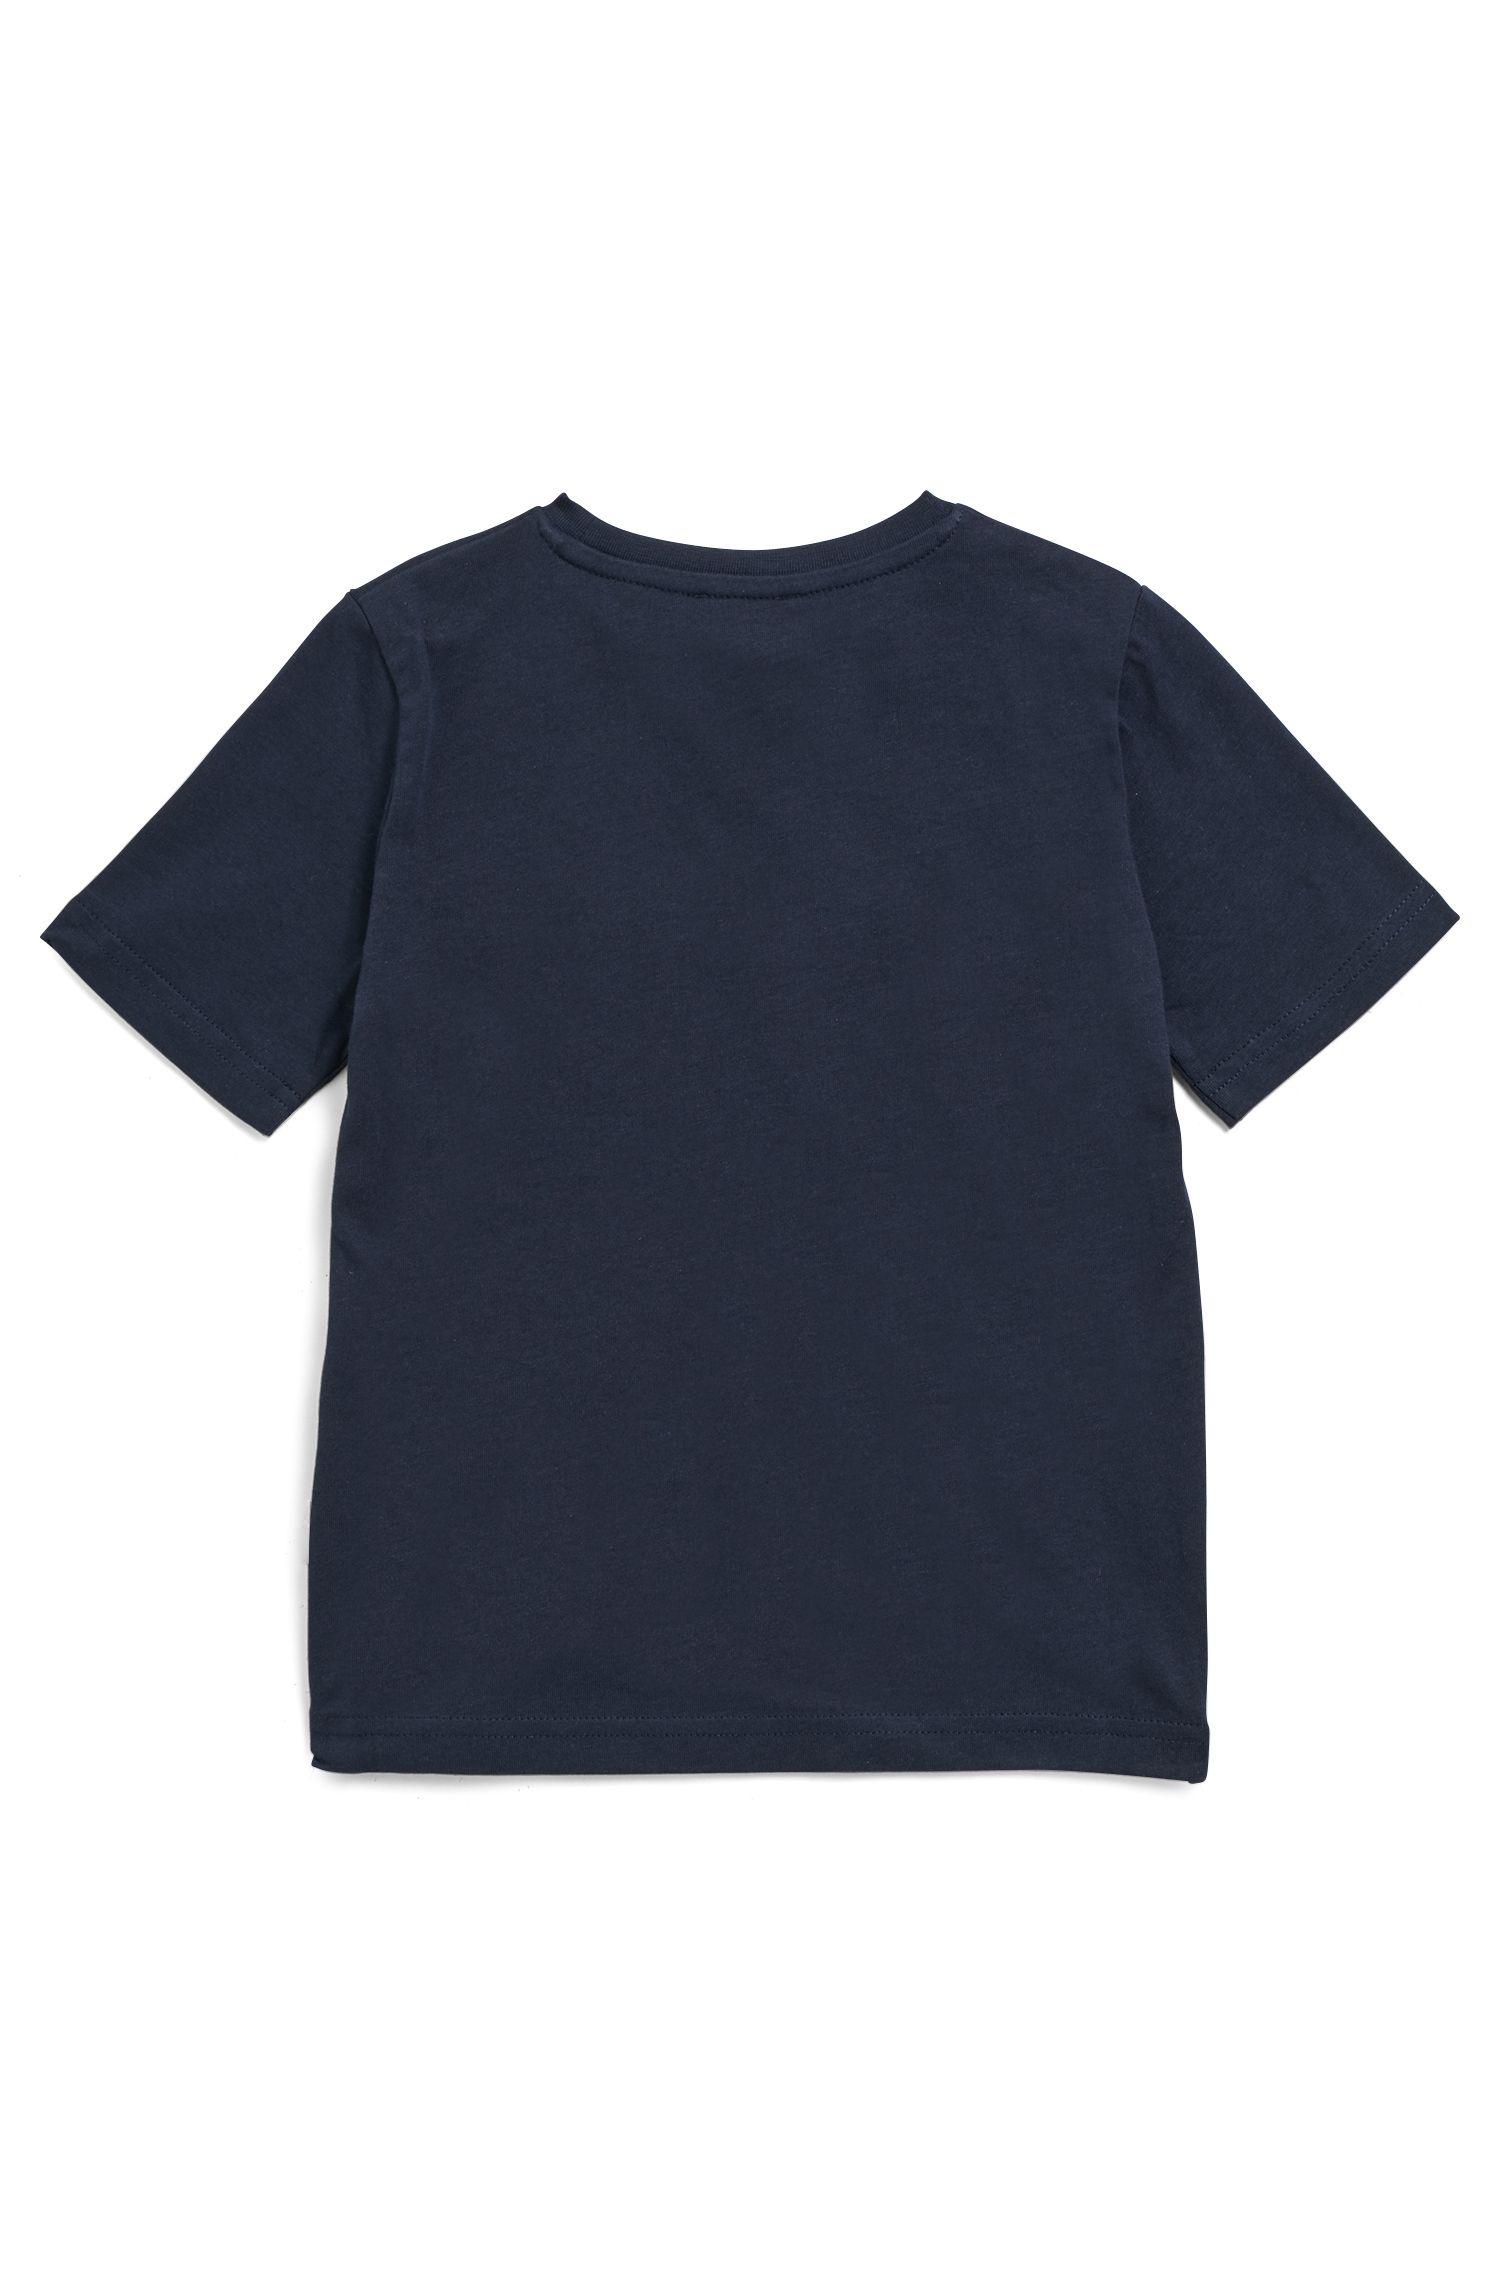 Kids' T-shirt in pure cotton with high-density logo, Dark Blue